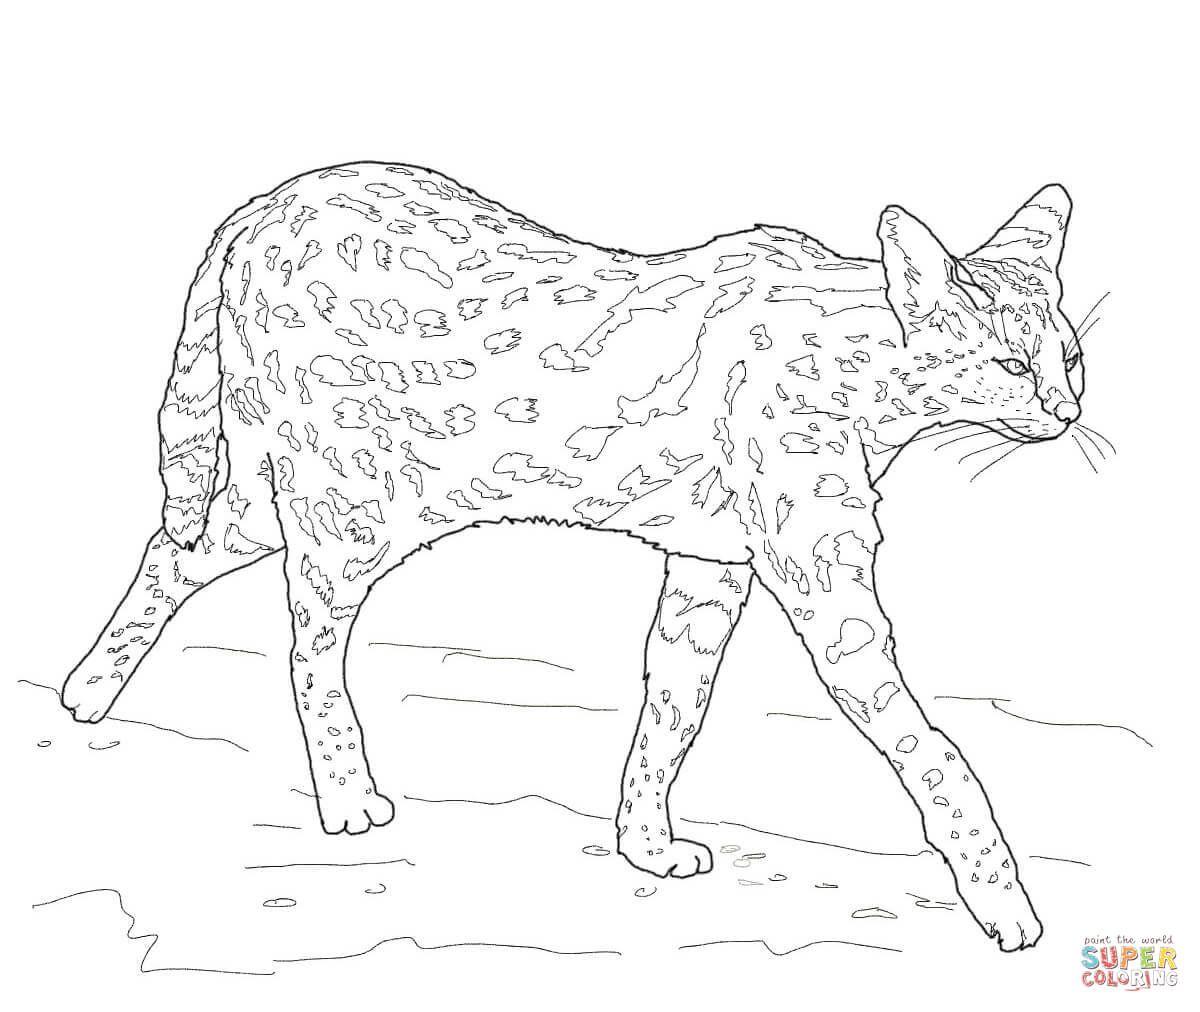 Serval Ausmalbilder Ausmalbilder Serval Ausmalbilder Ausmalen Serval [ 1012 x 1200 Pixel ]